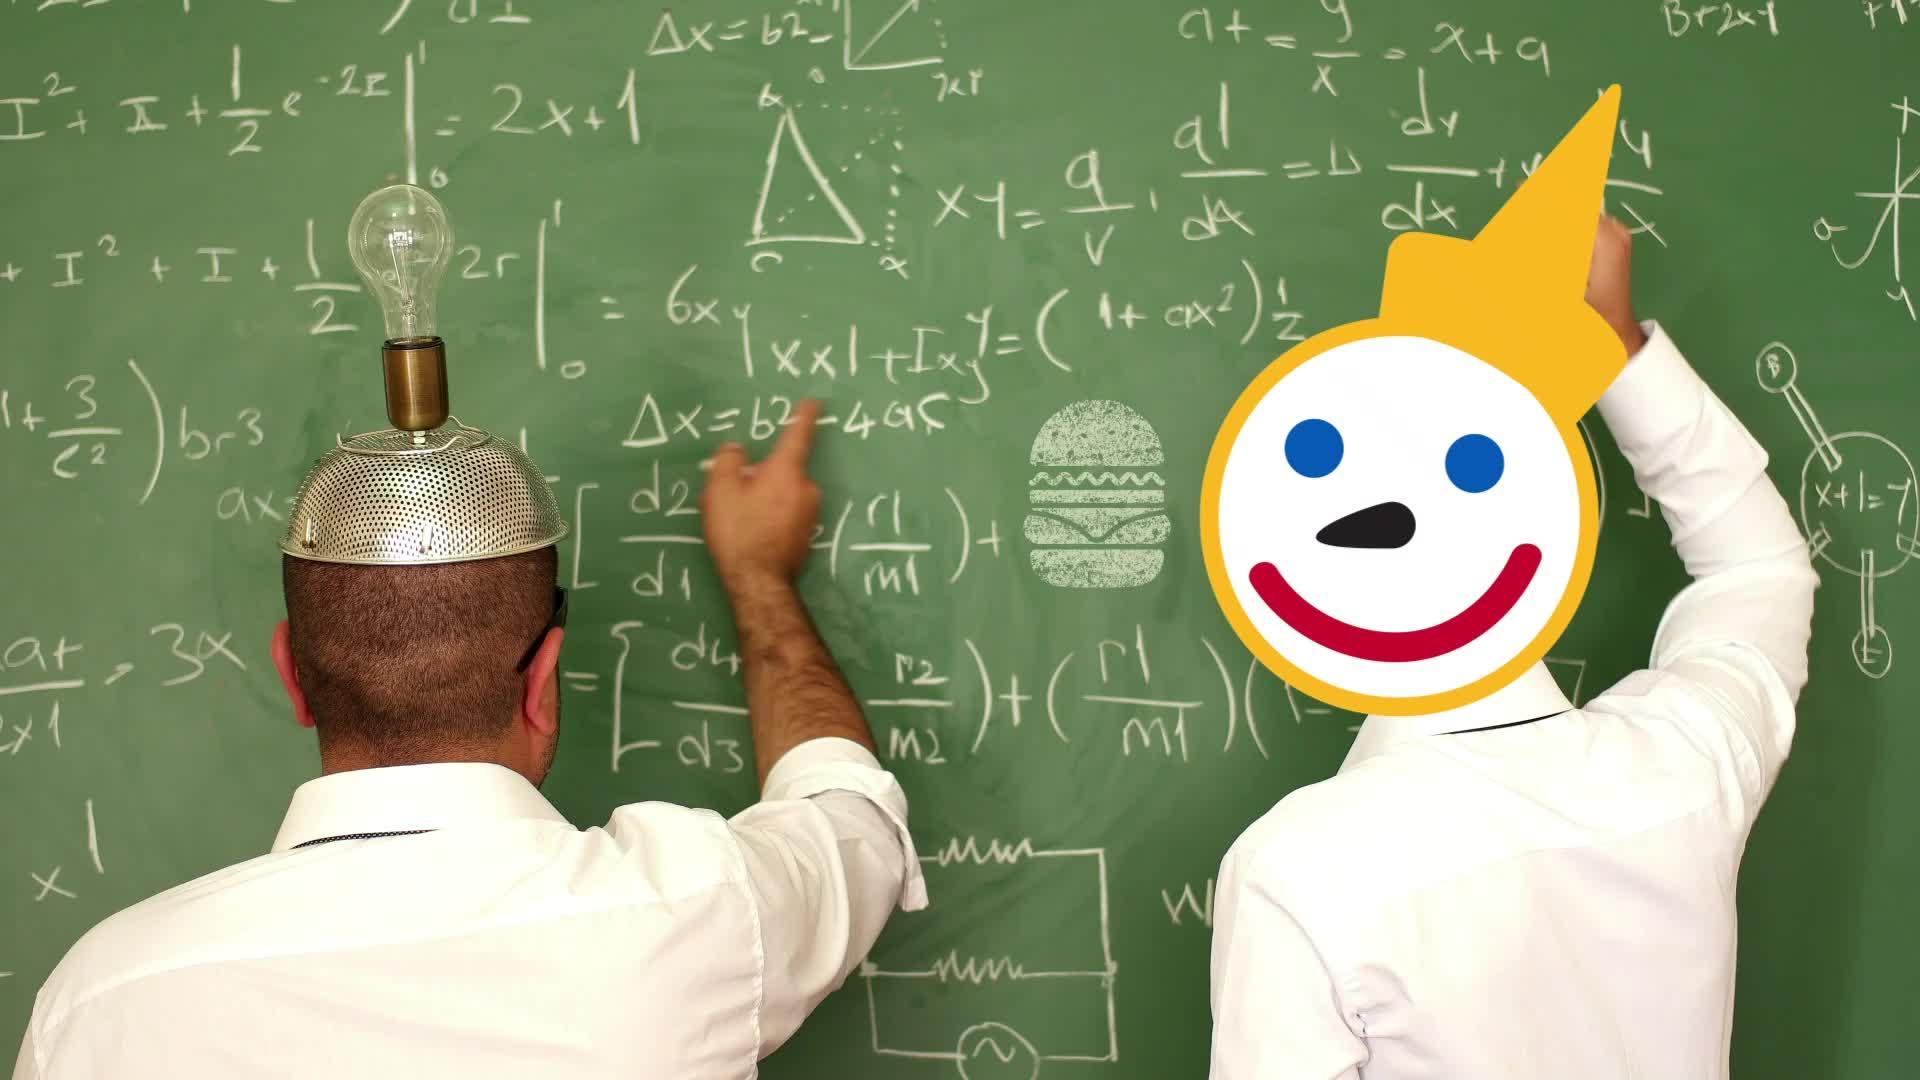 chalkboard, equation, eureka, genius, idea, jack in the box, light bulb, math, think, thinking, thought, Chalkboard Light Bulb Idea GIFs